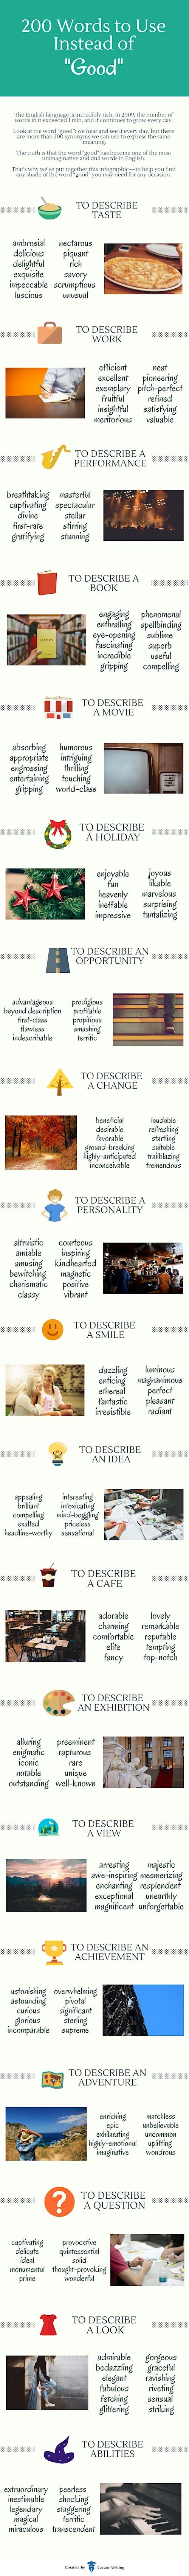 words-instead-of-good2